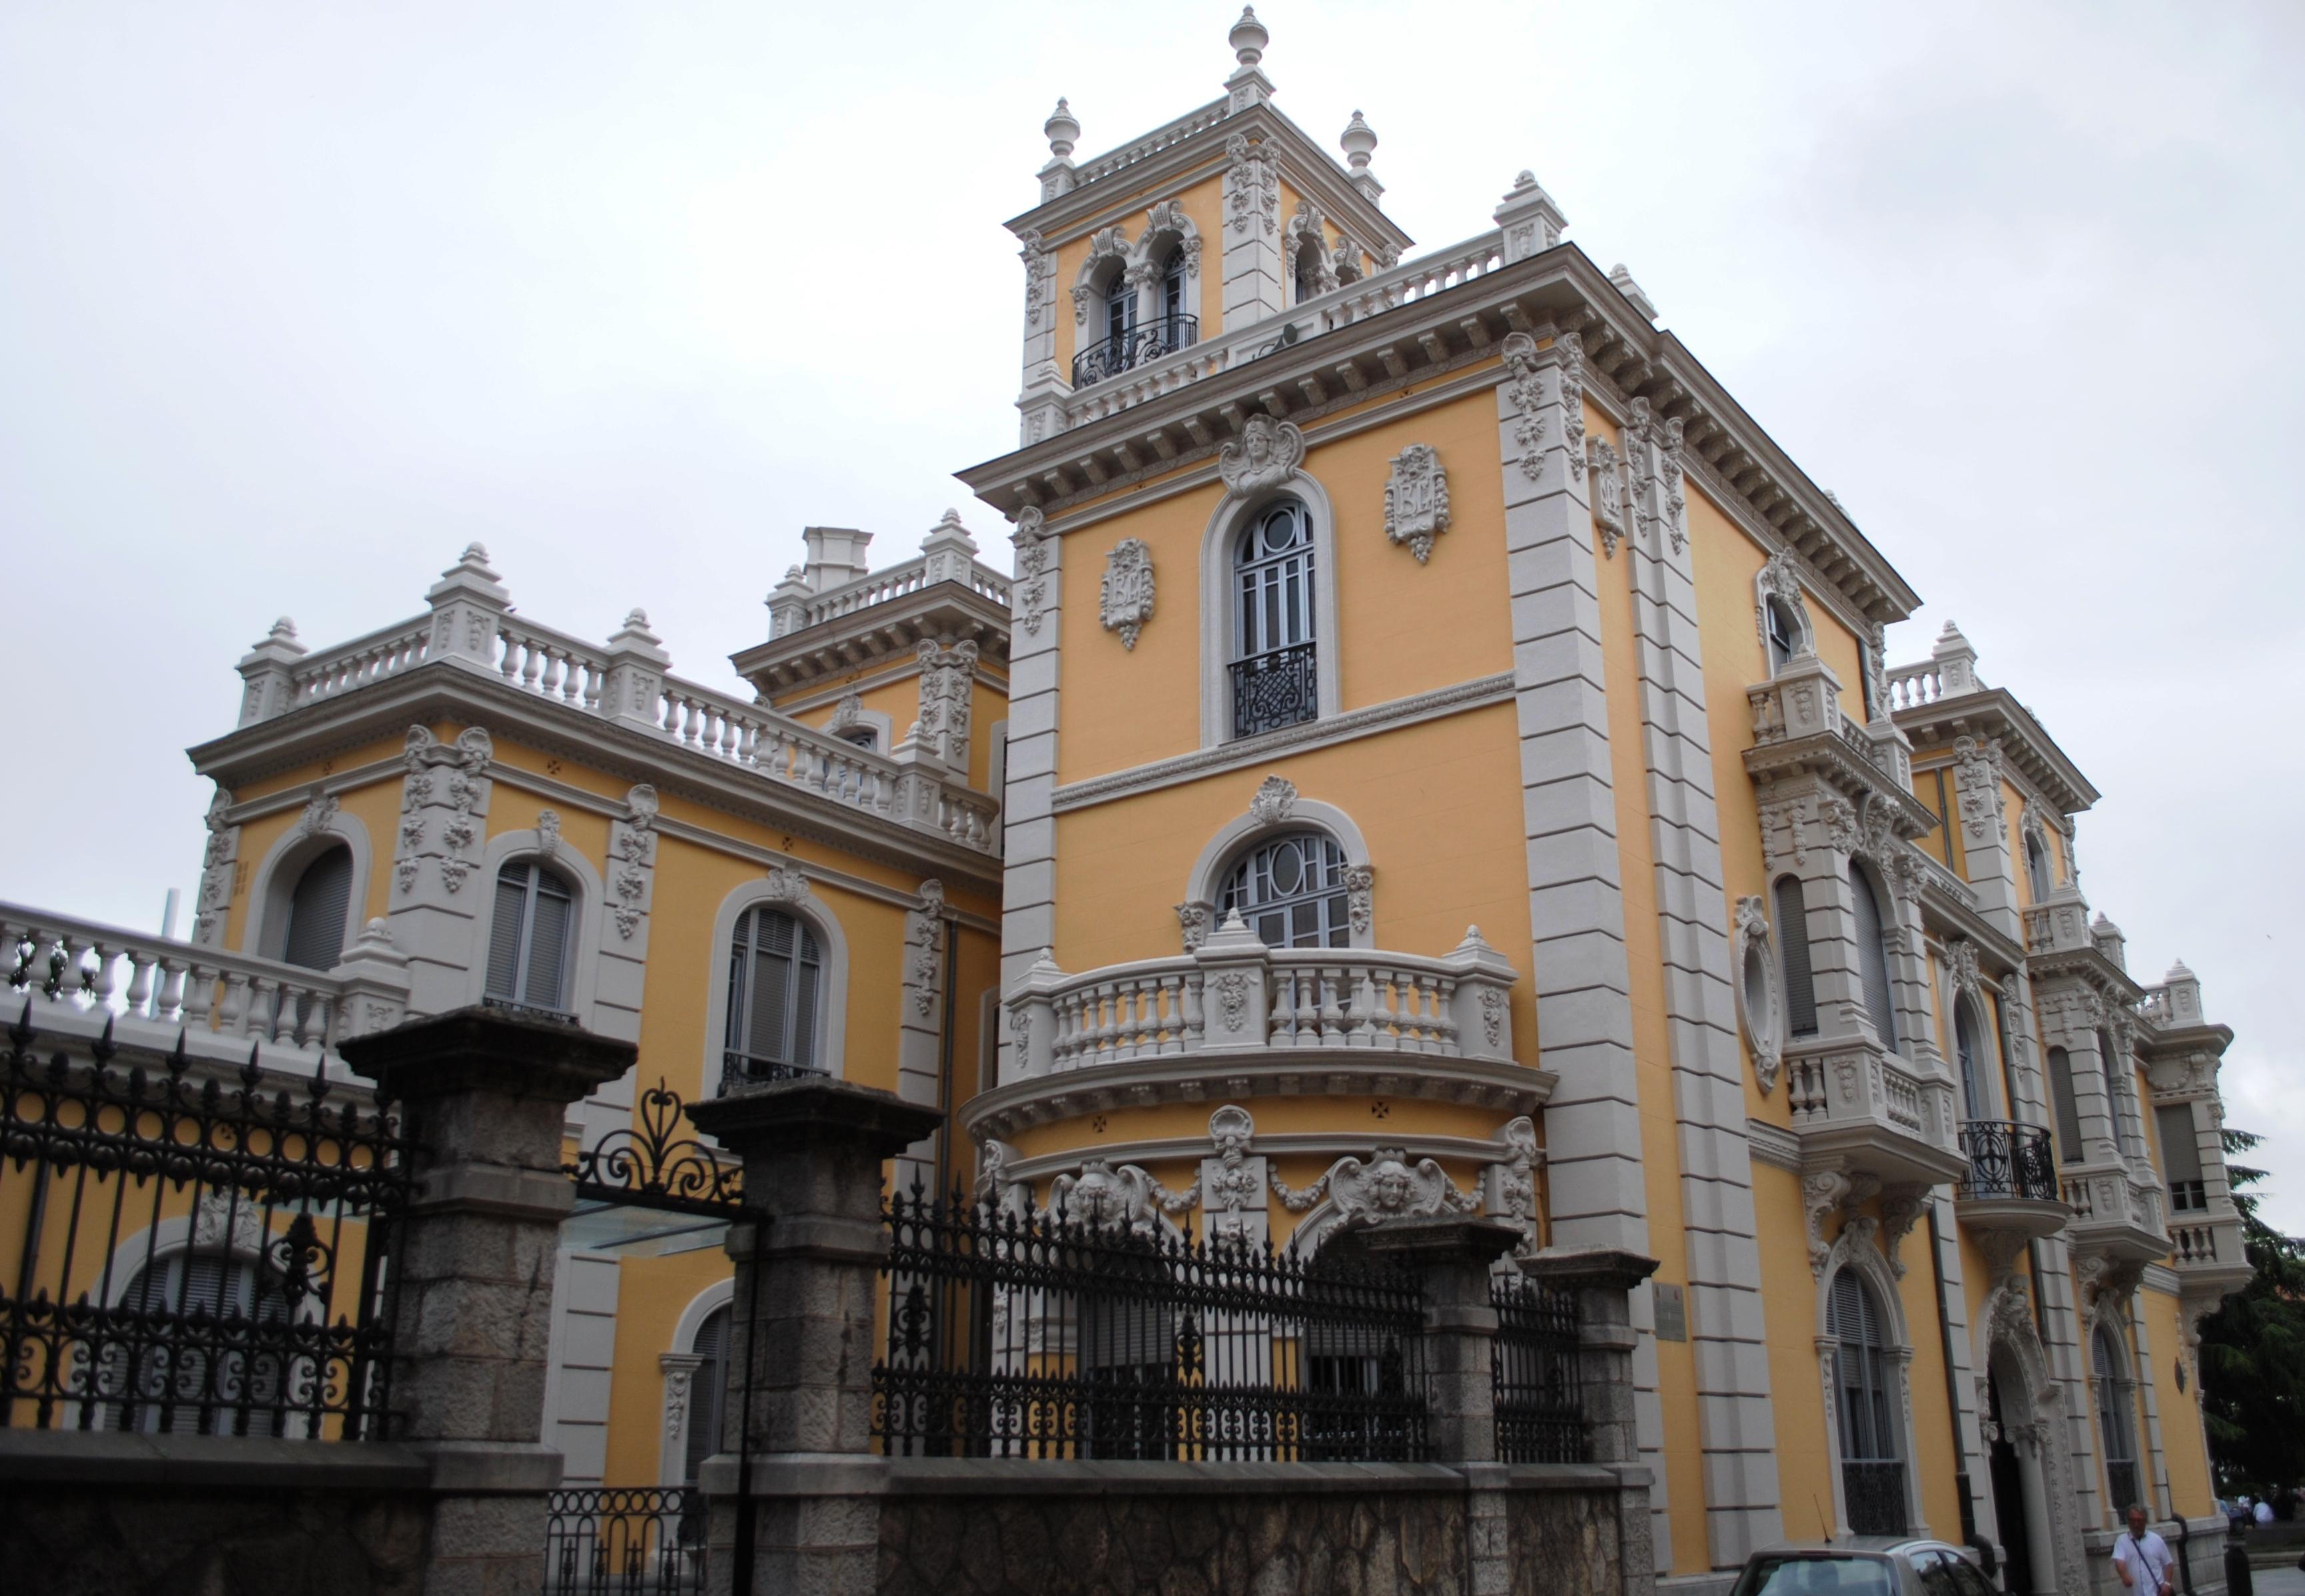 File:Avilés, Palacio Balsera (2).JPG - Wikimedia Commons